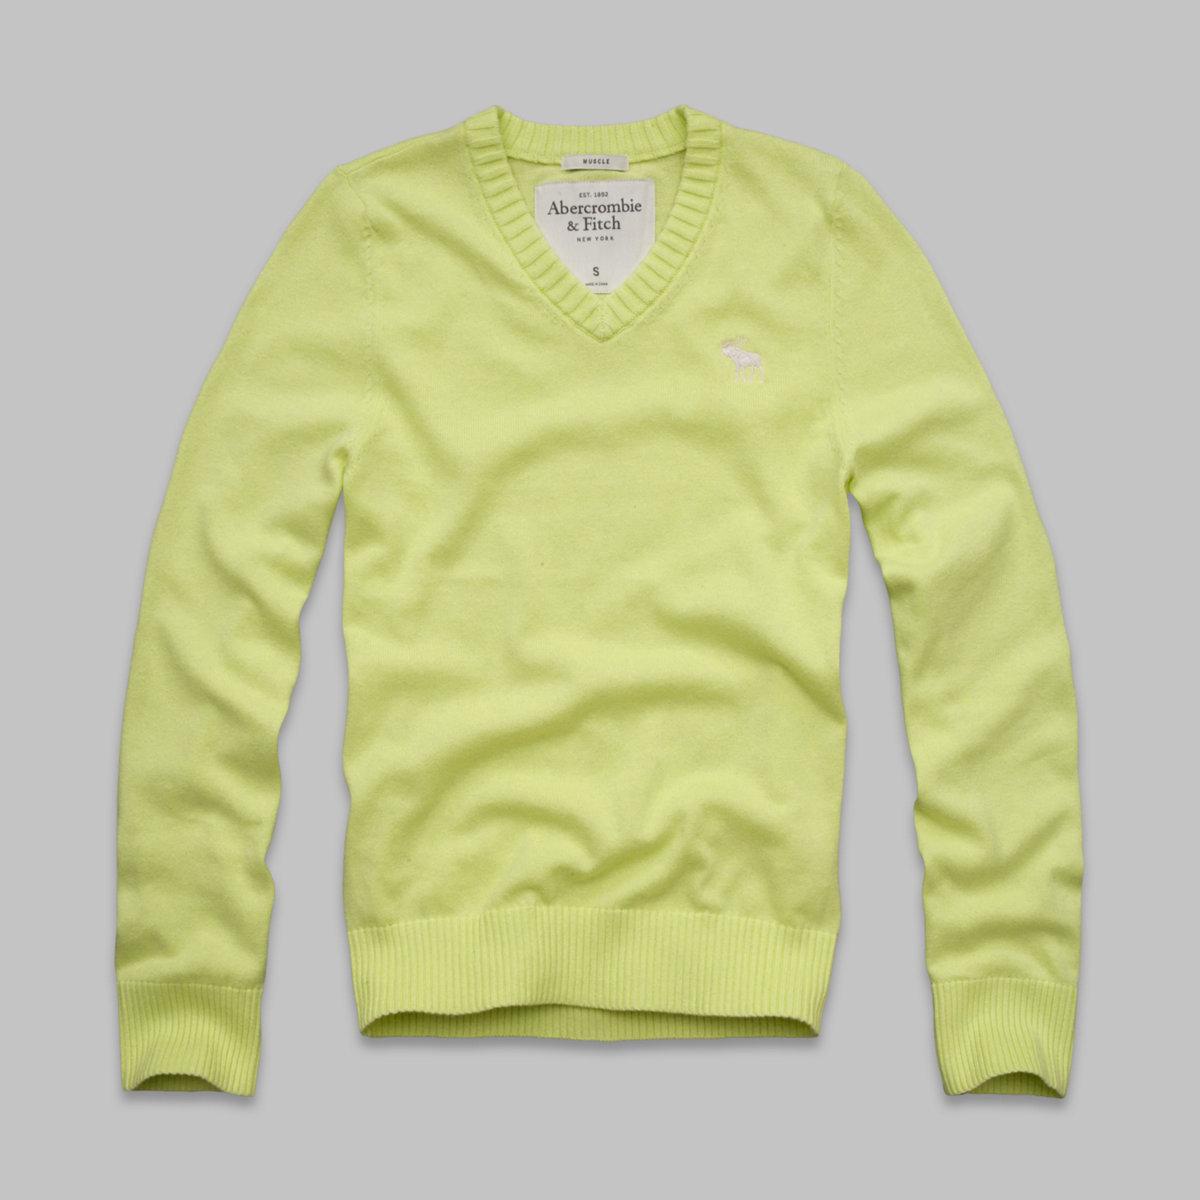 Goodnow Mountain Sweater